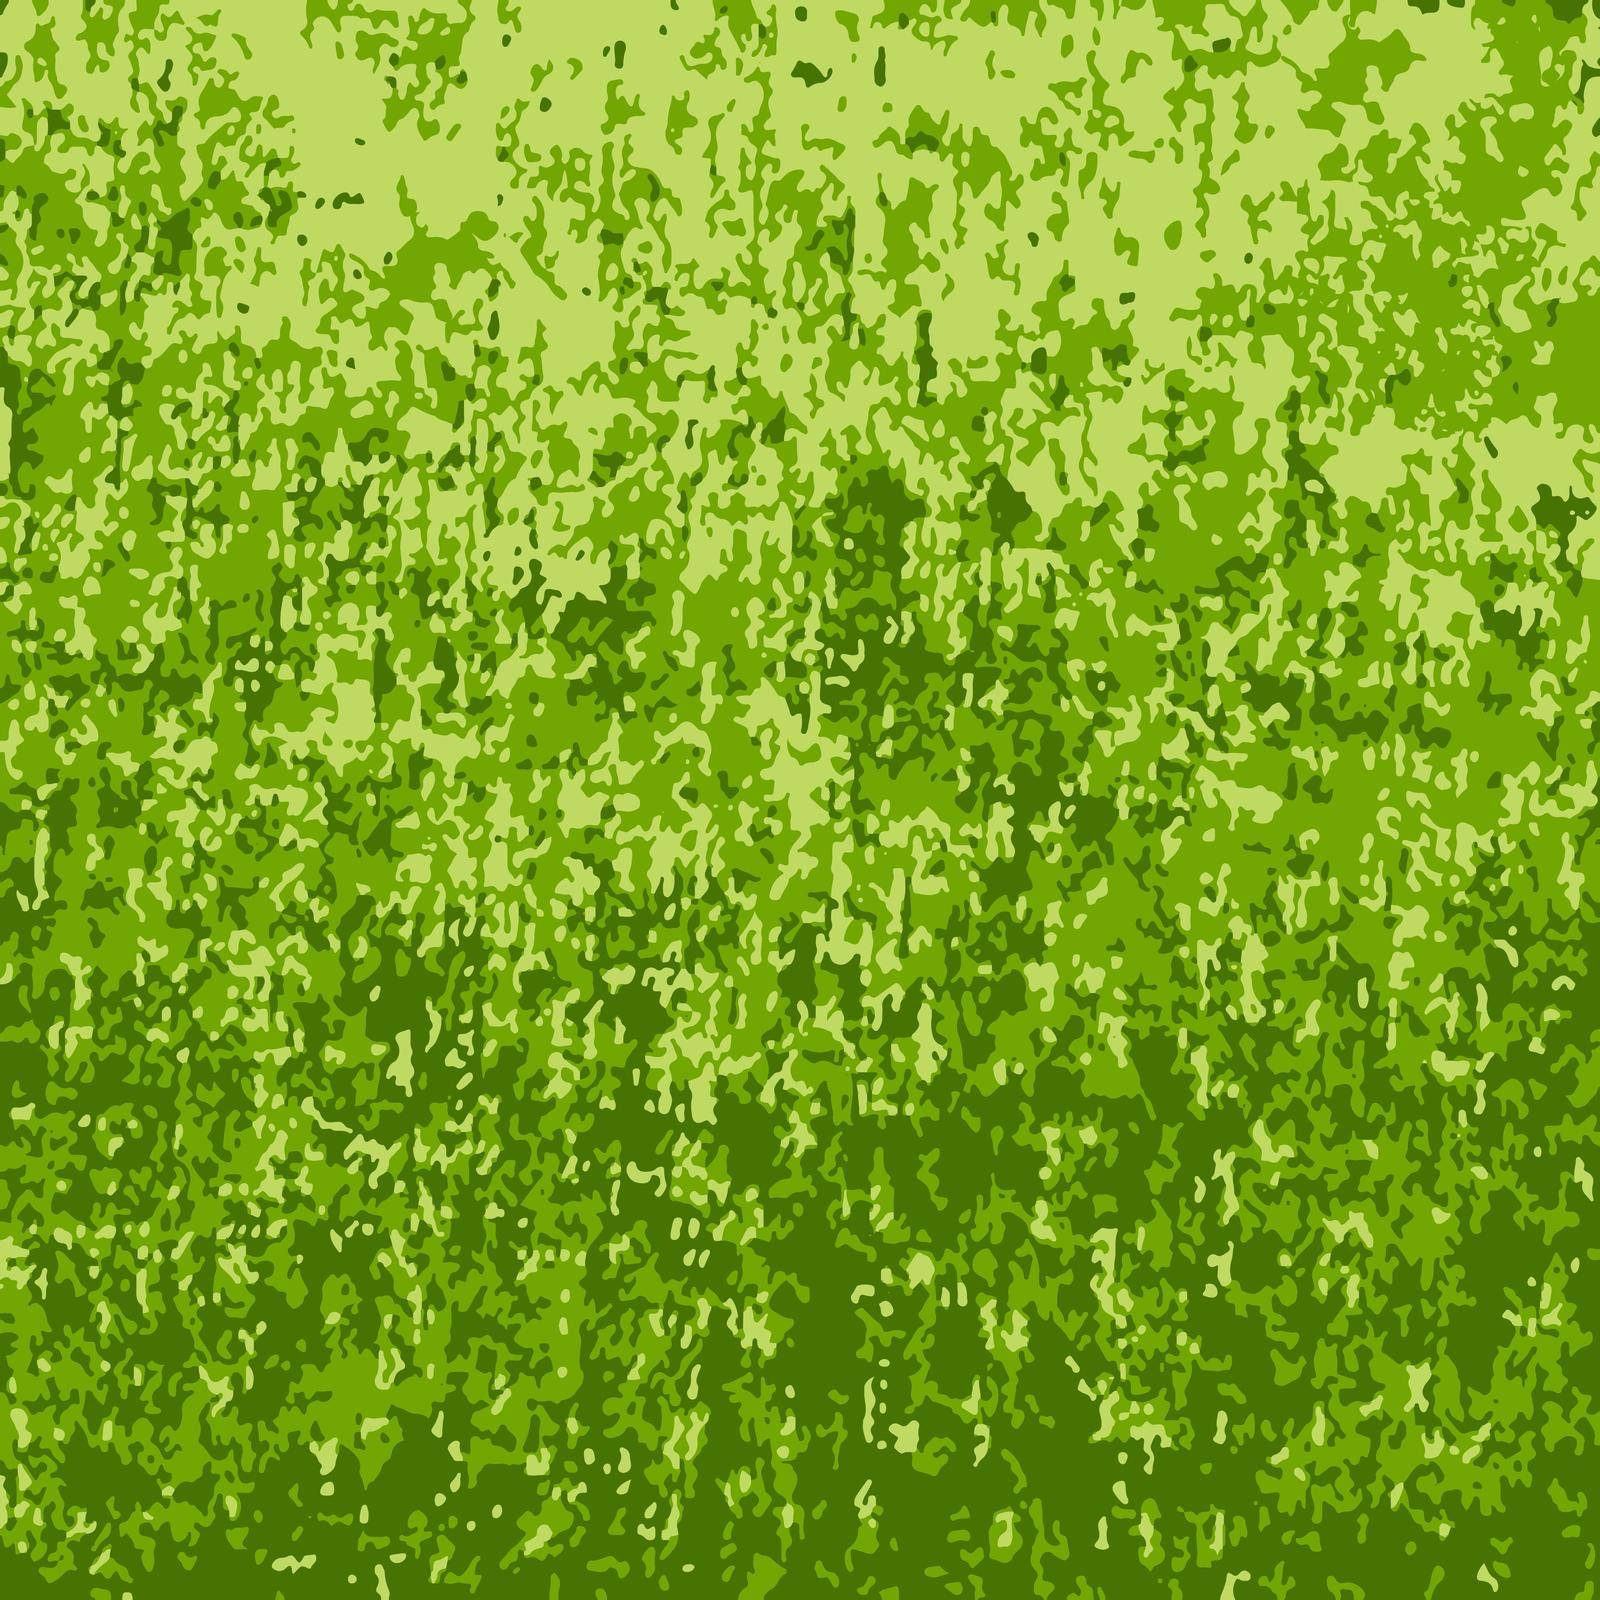 Green camouflage grunge background vector green camouflage background